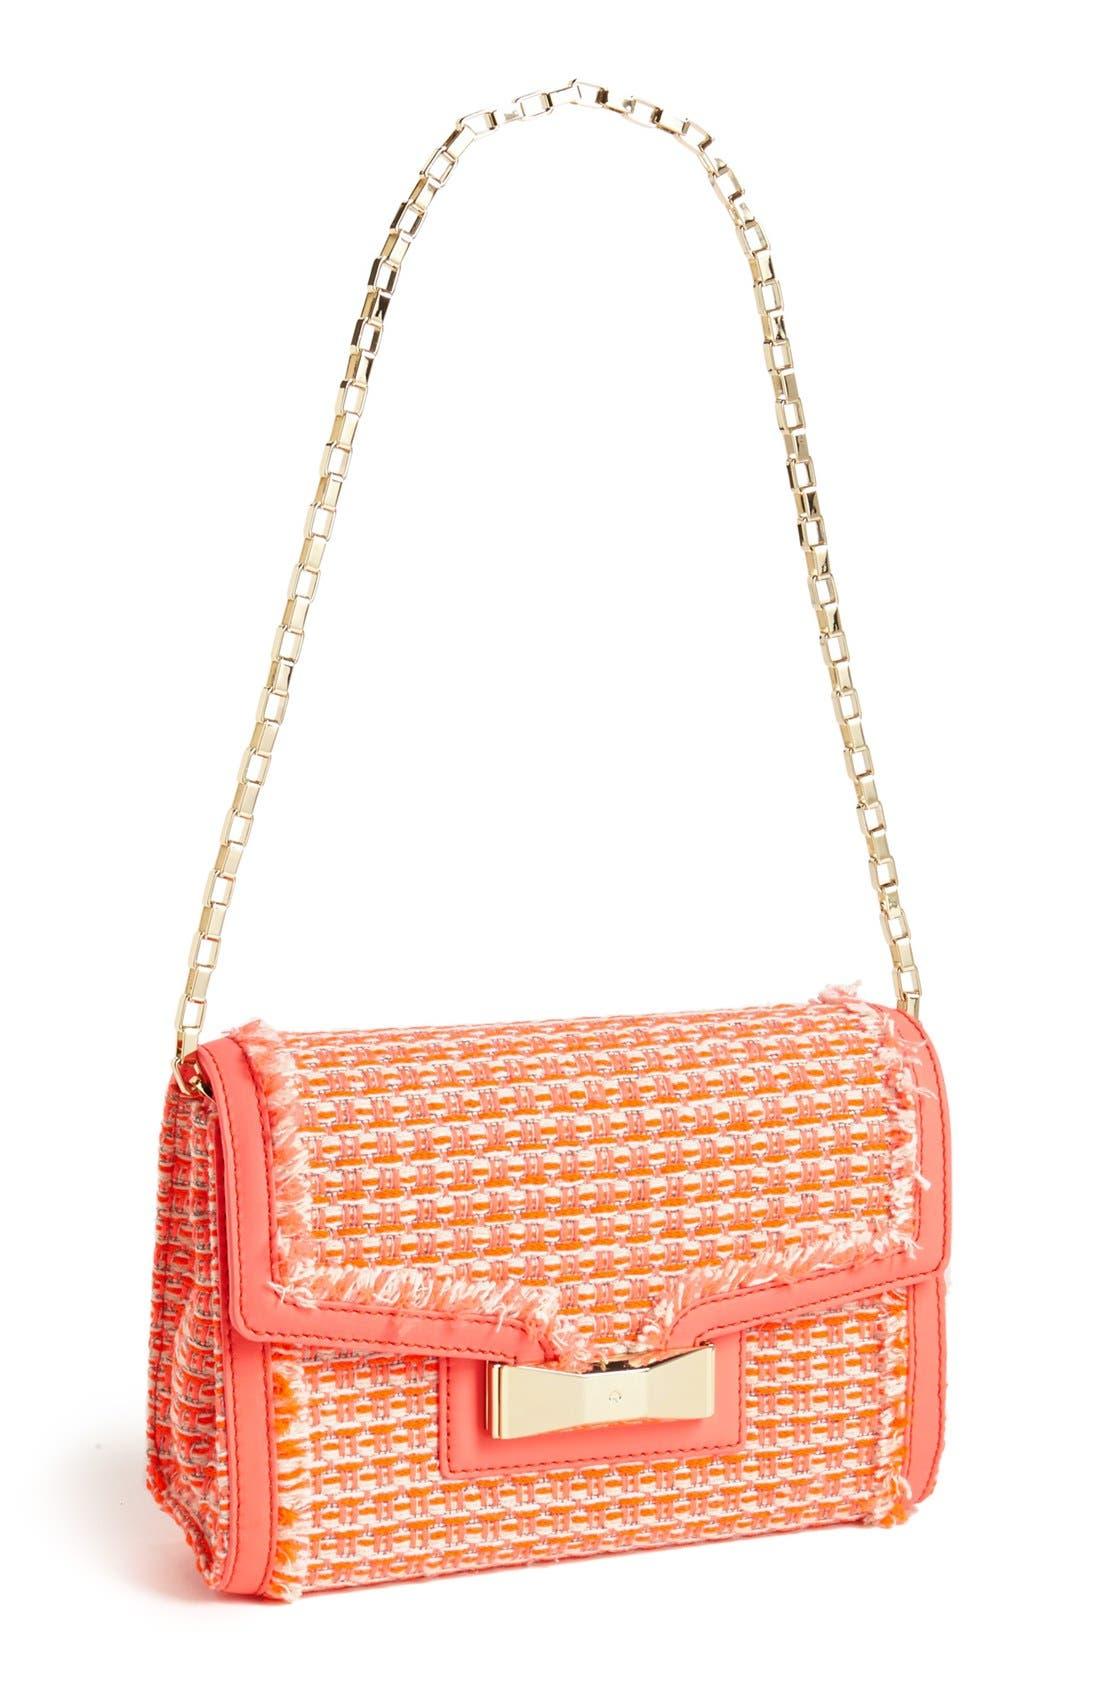 Main Image - kate spade new york 'carroll park - scarlette' tweed shoulder bag